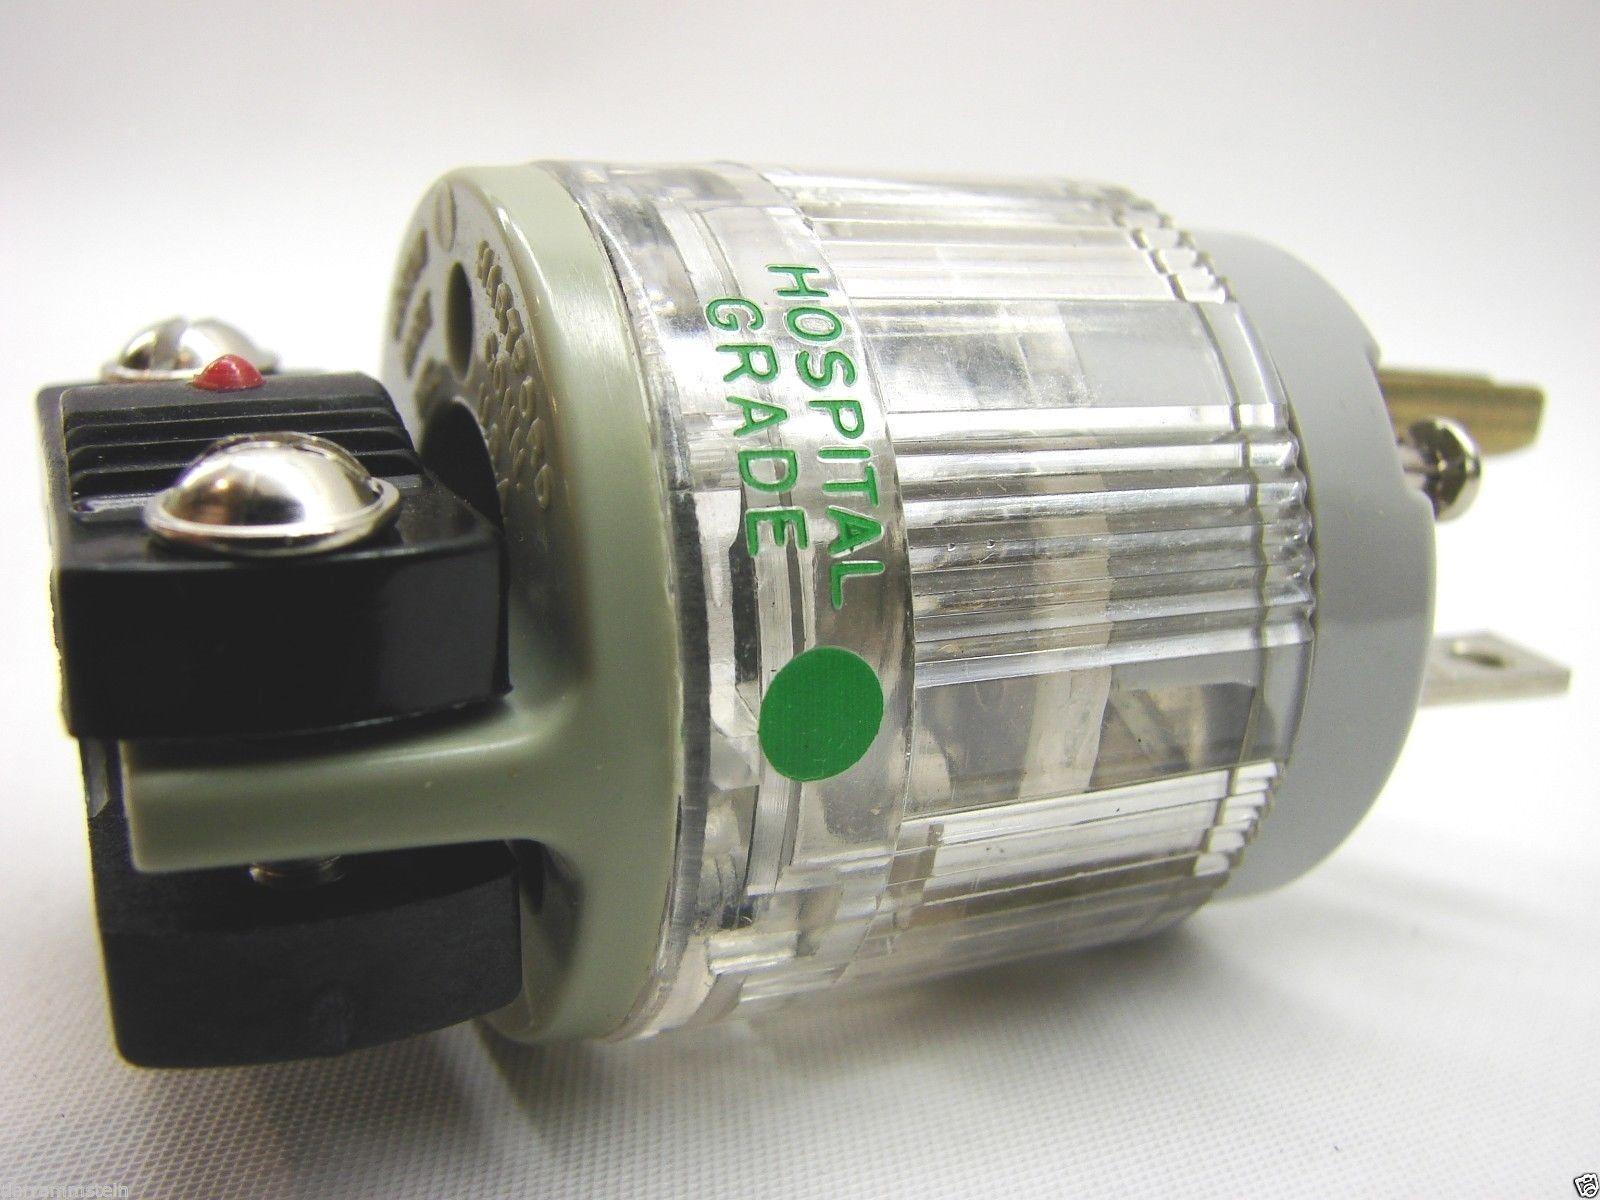 Arrow-Hart 6766-HG Hospital Grade Plugs 125V 20A 2P/2W Clear NEMA 5-20P t12